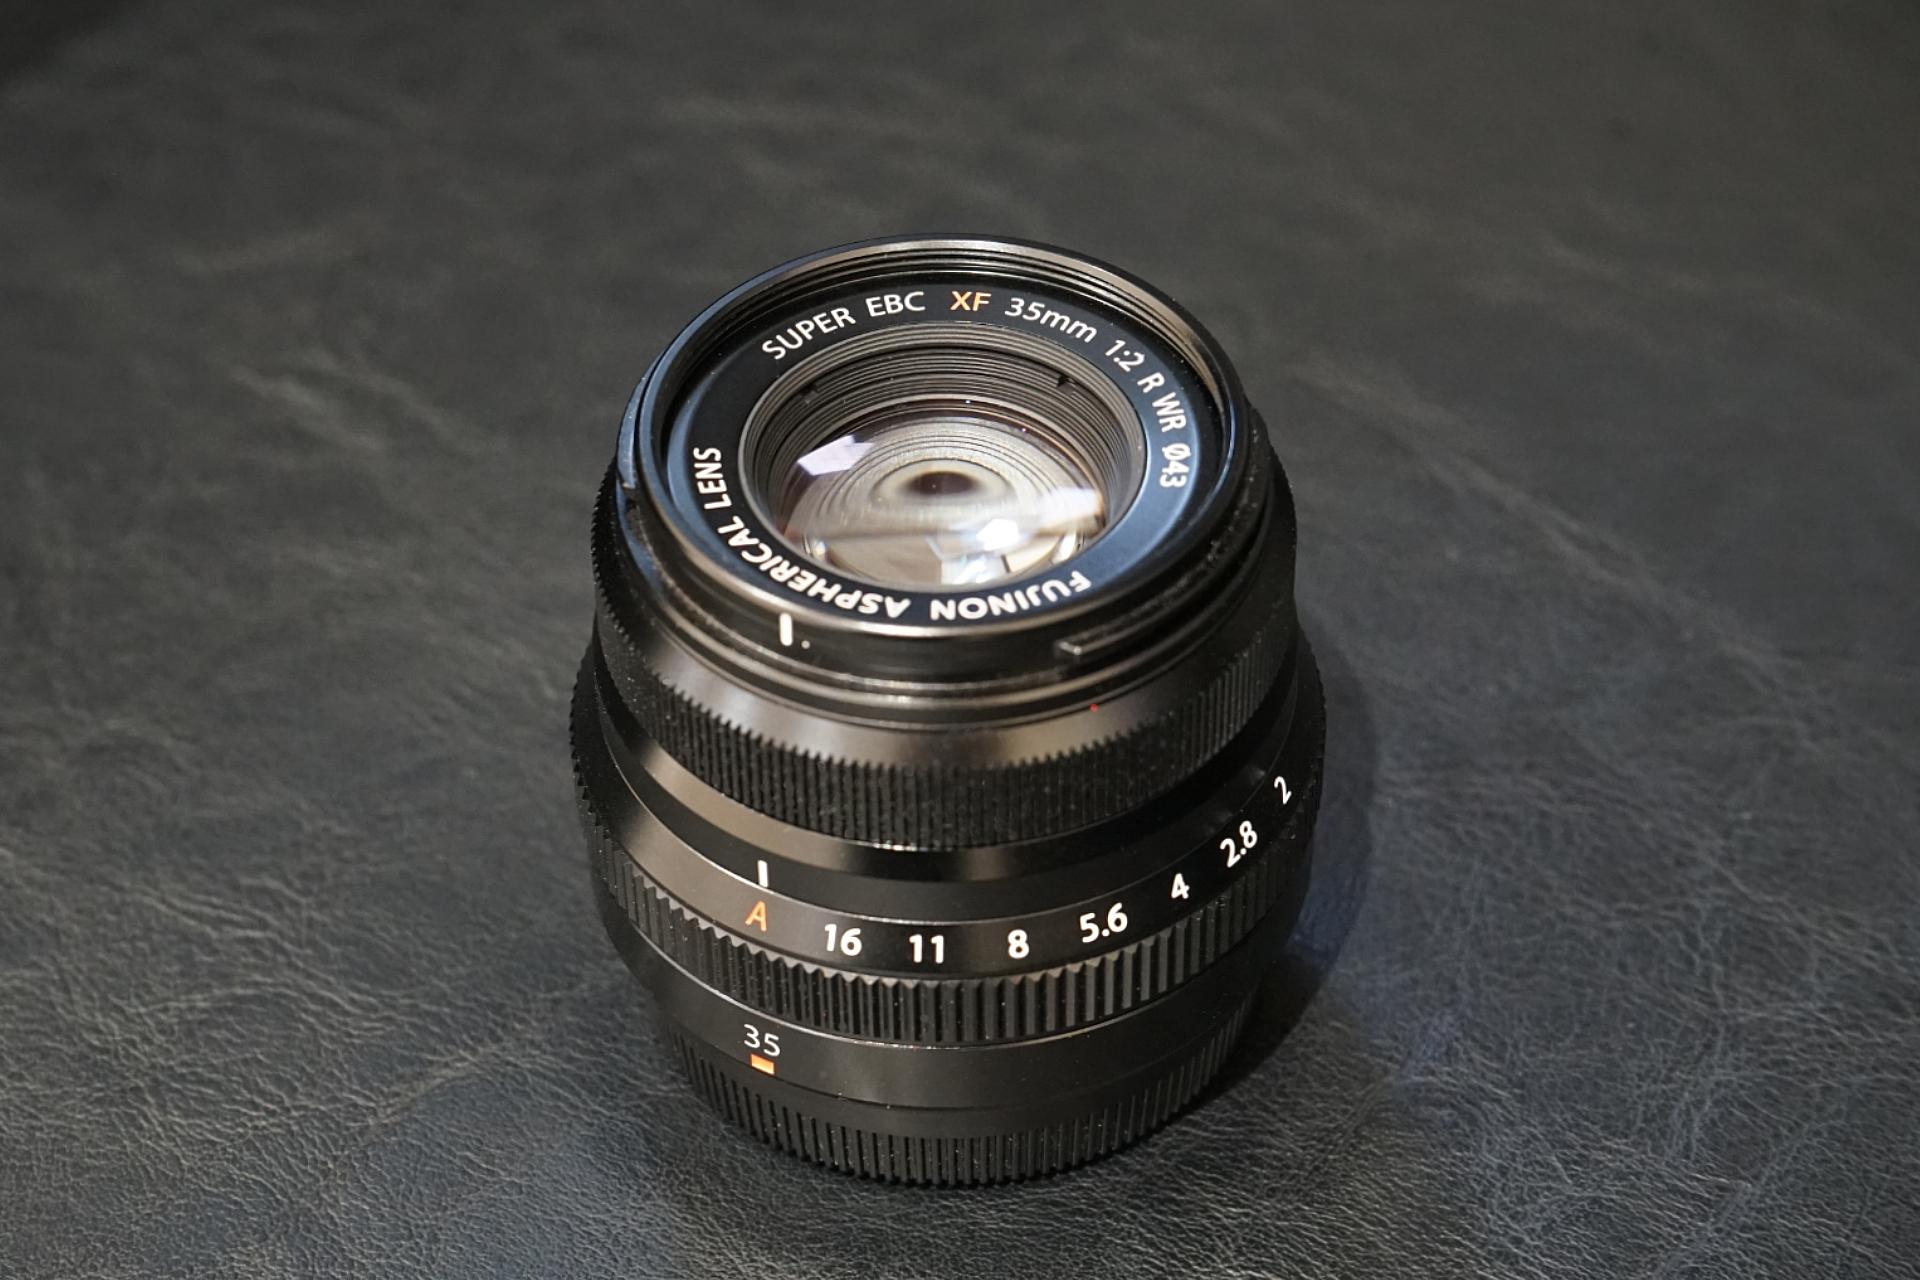 【FUJIFILM】 XF35mm F2 R WR に魅せられて